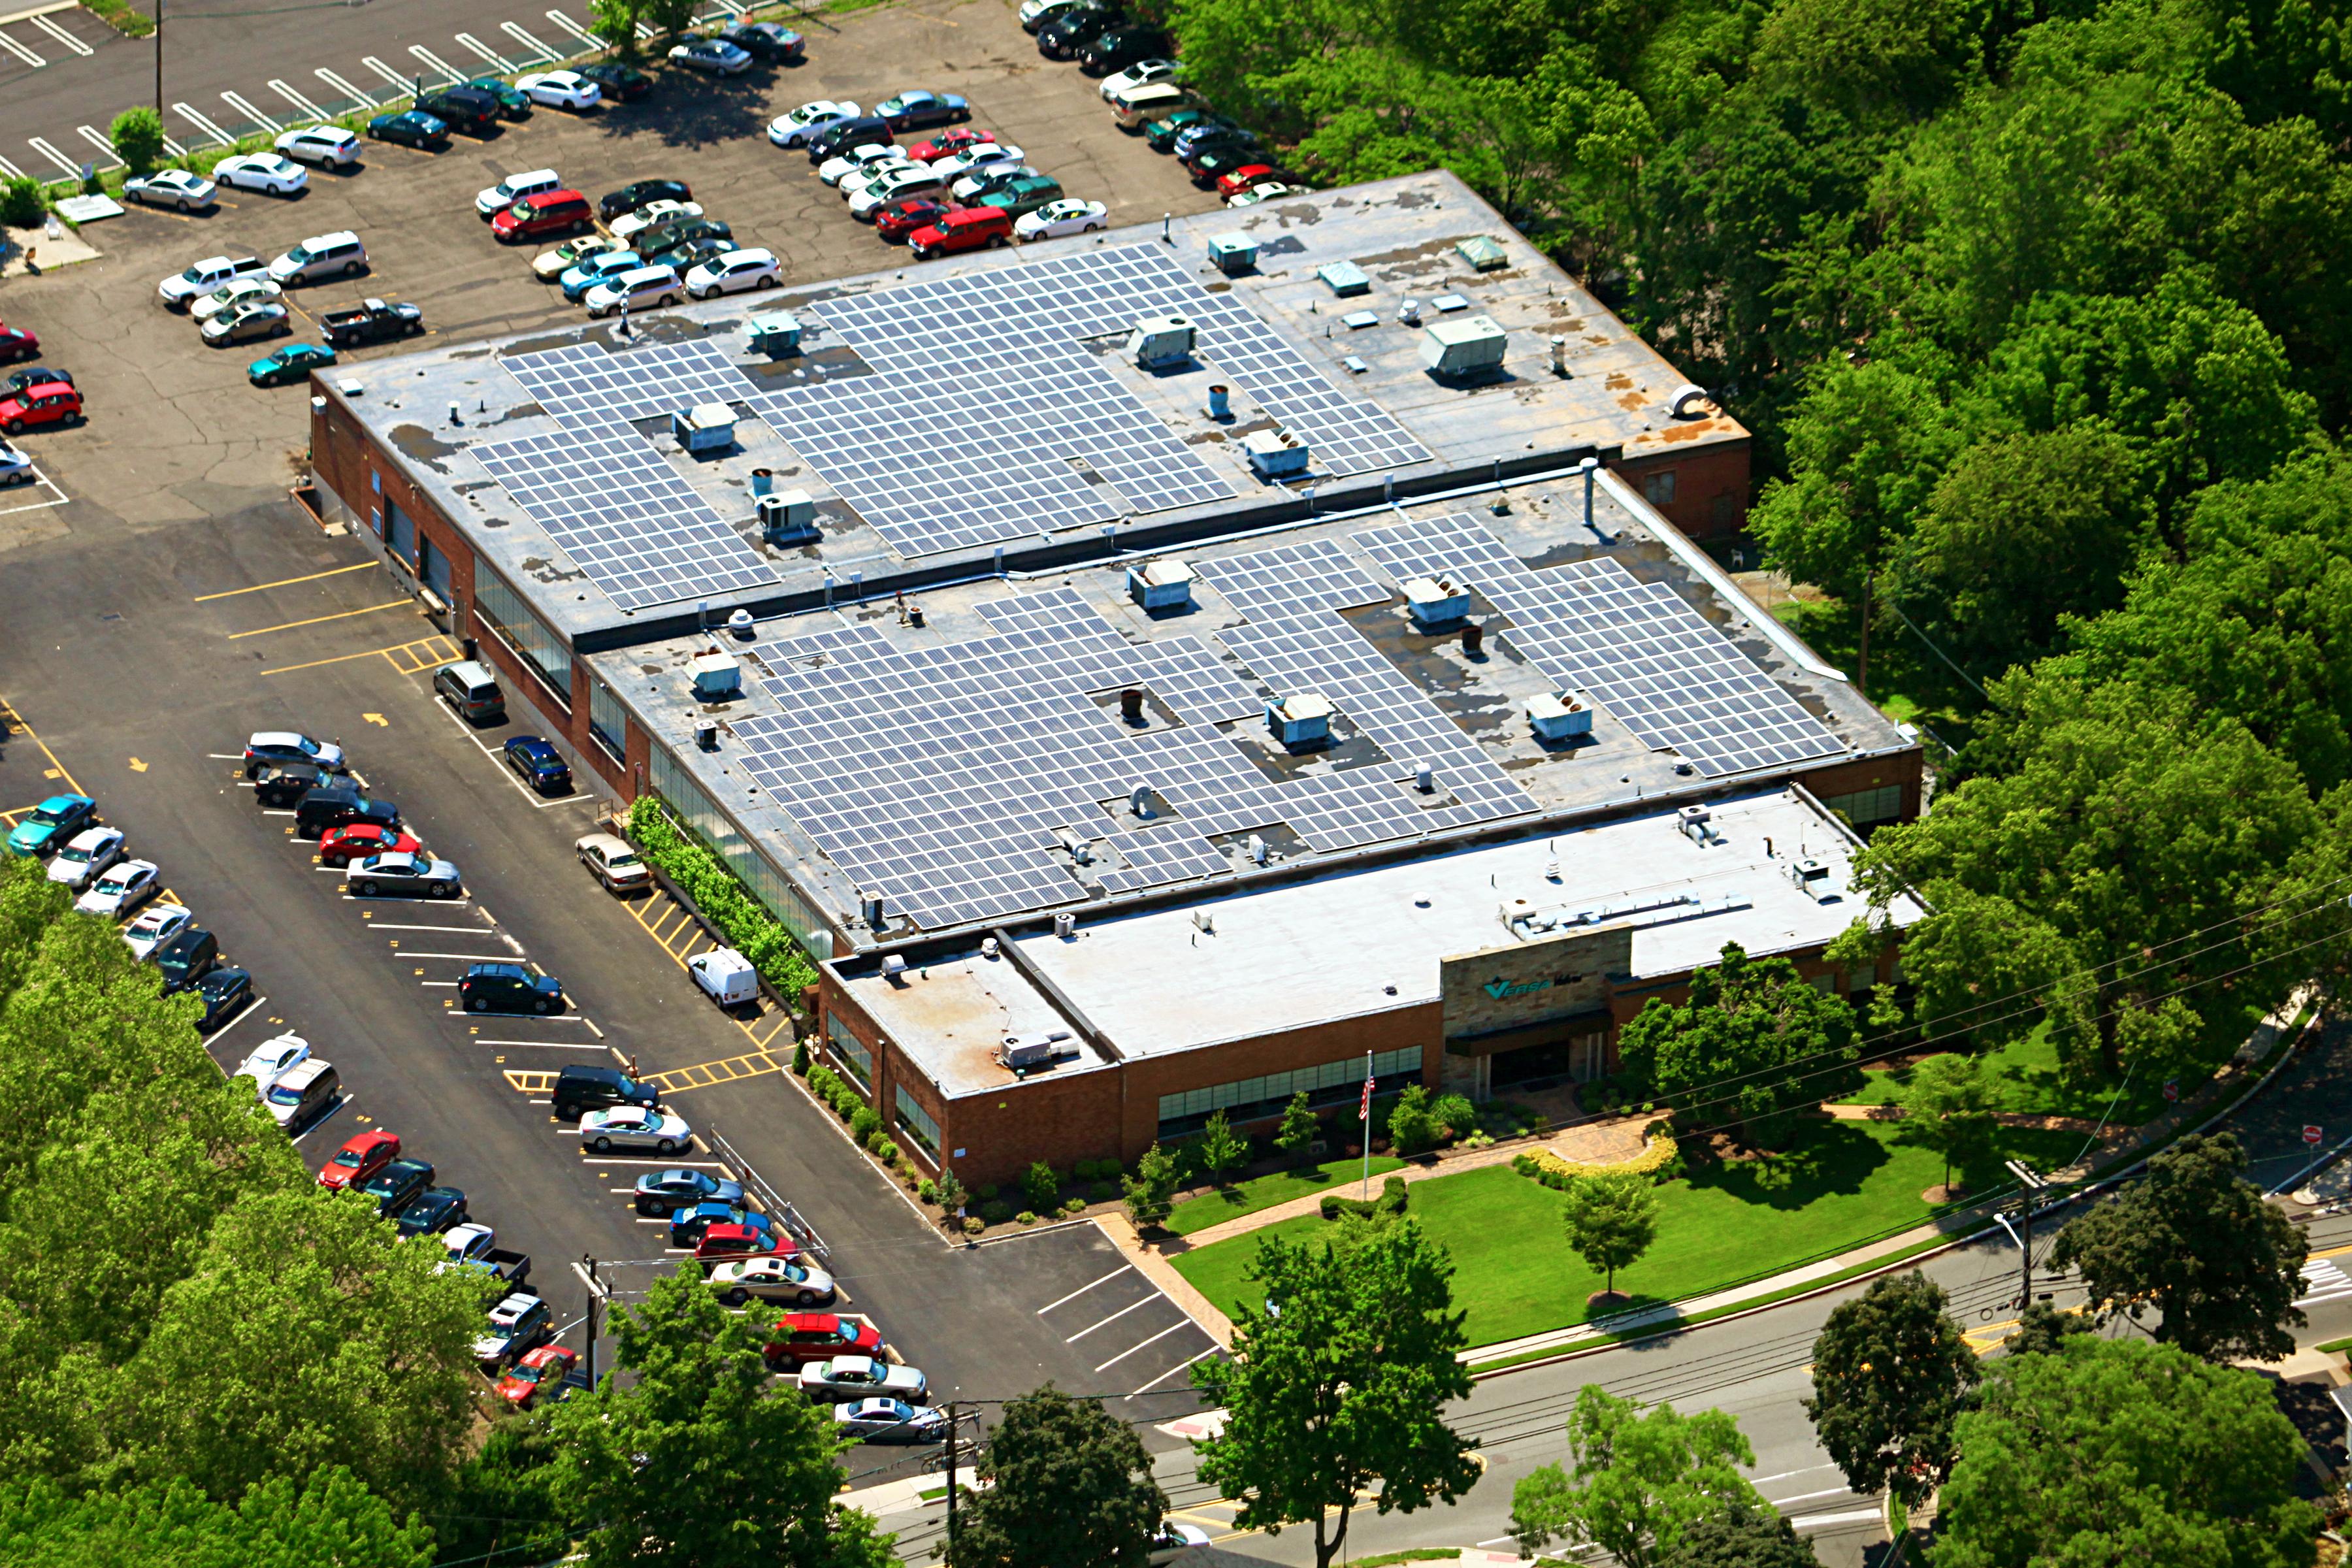 versa-products-company-green-solar-panels